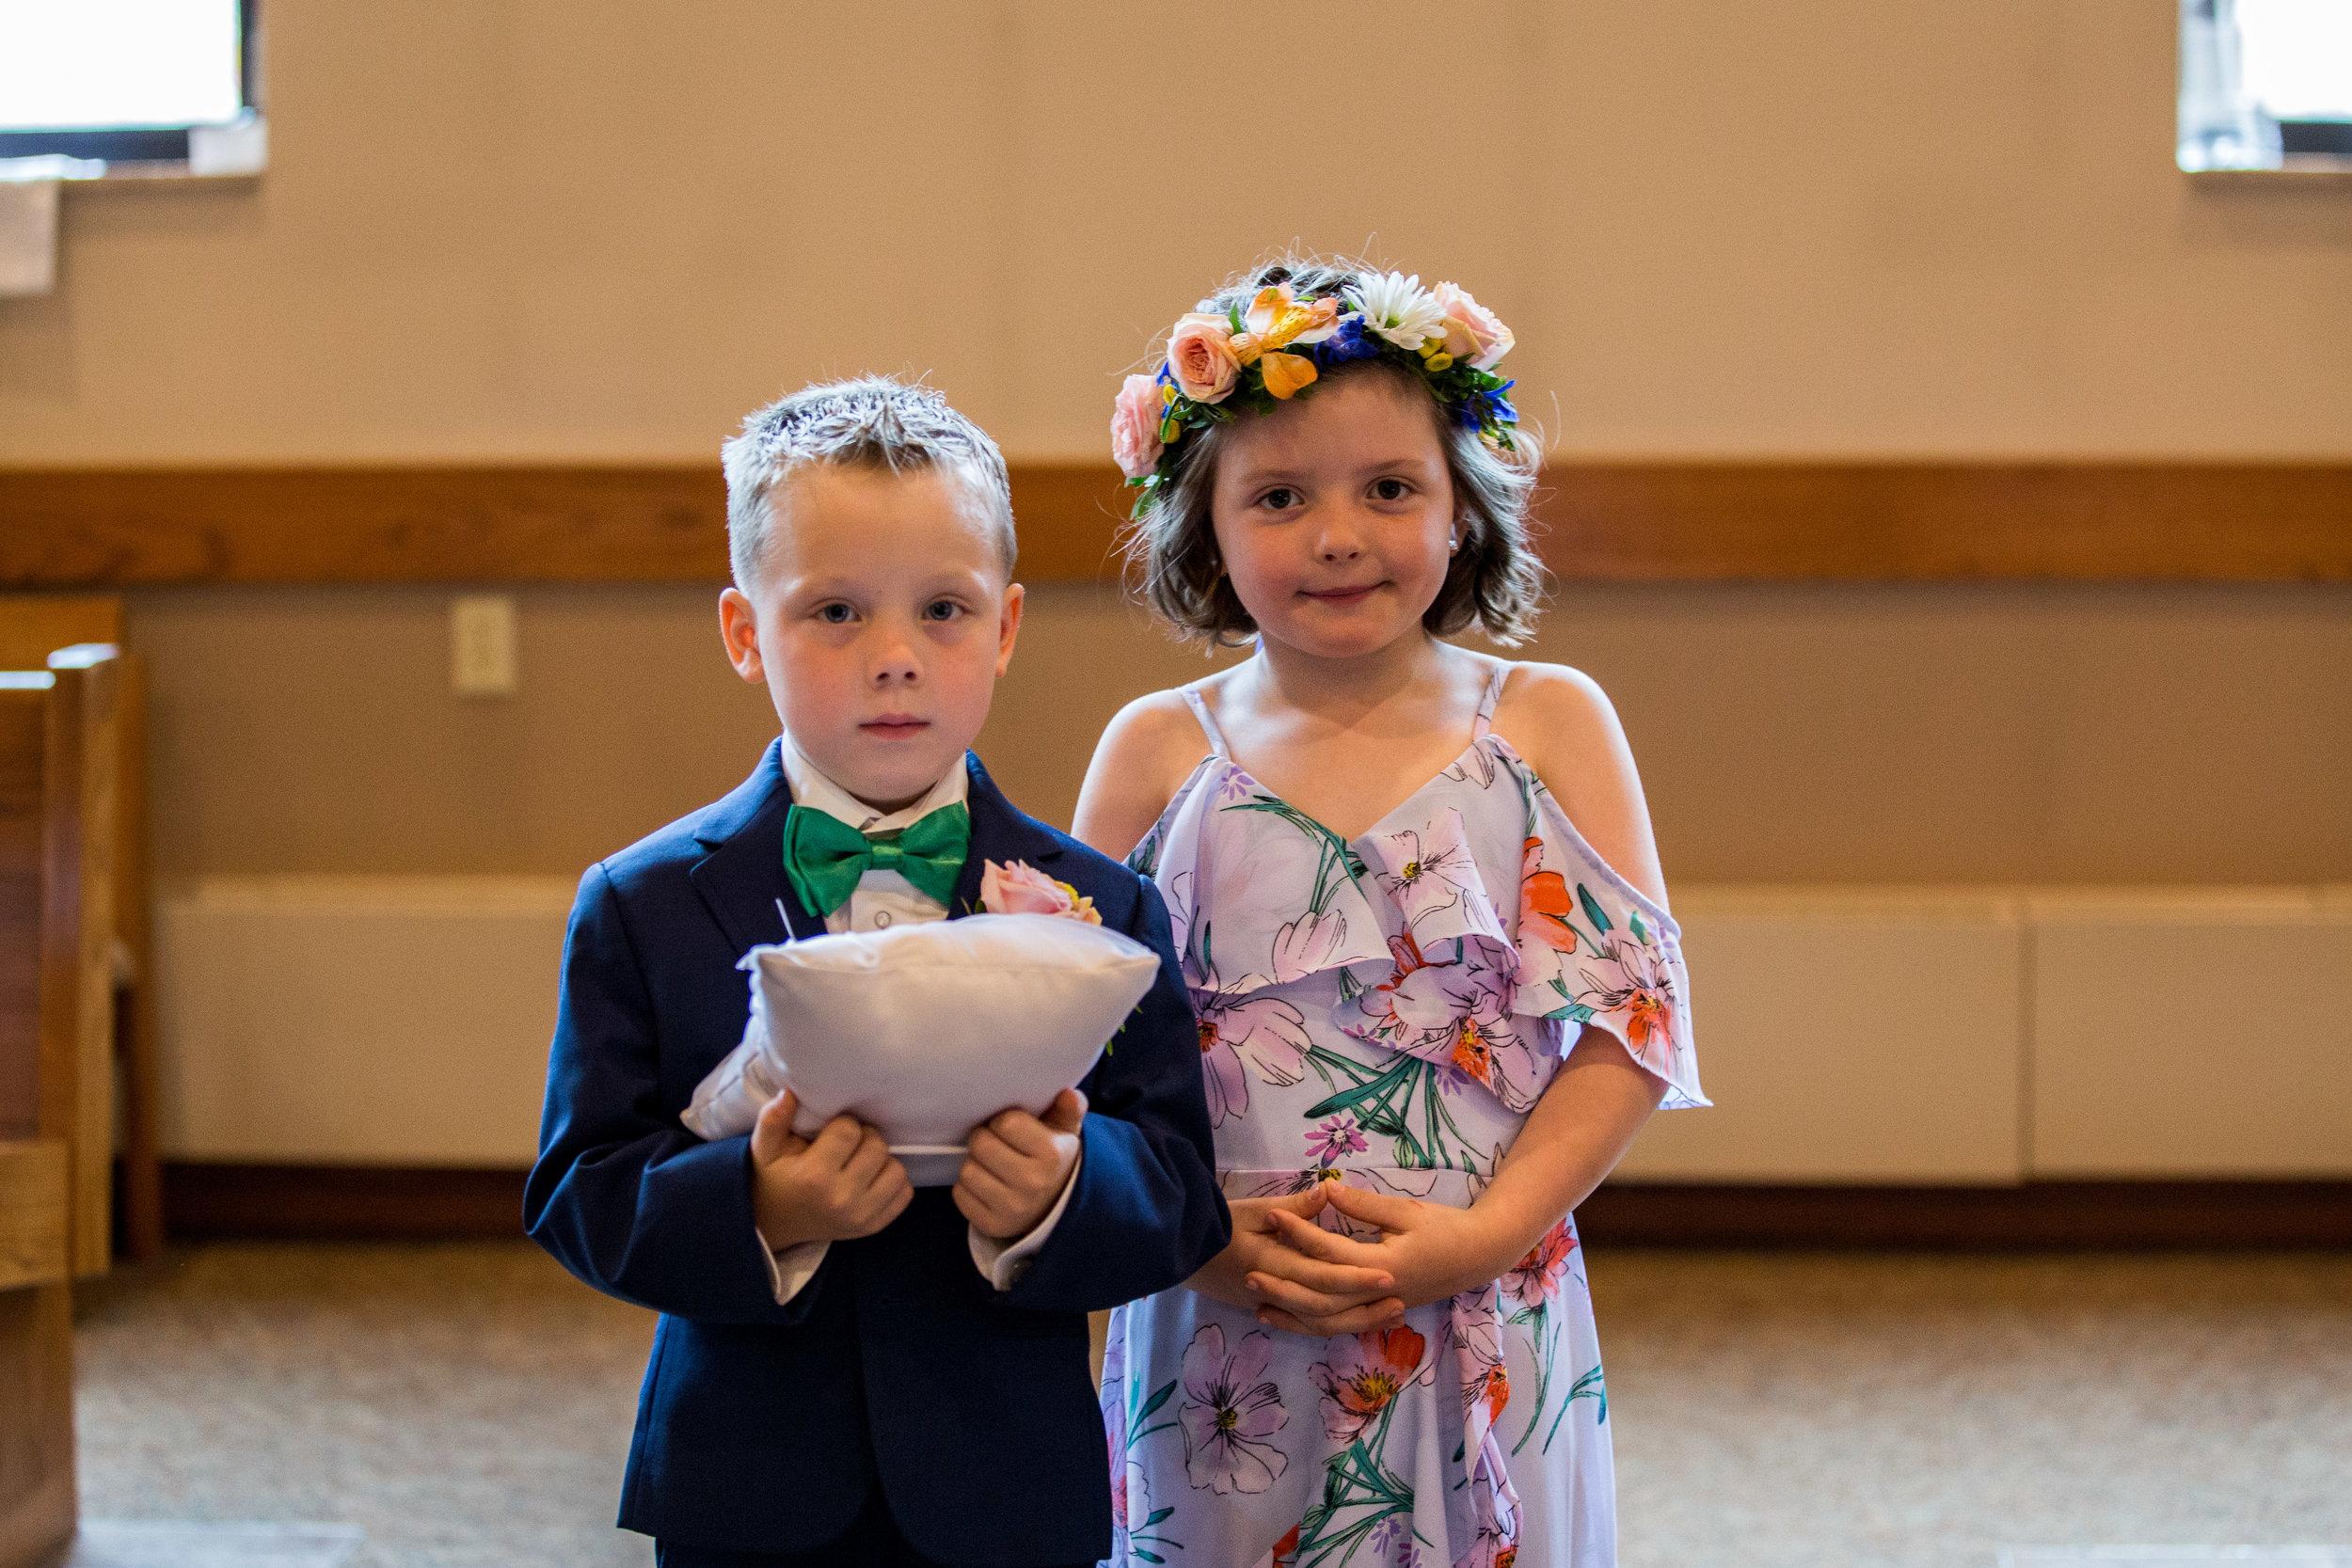 Natalie and Dallas Mooney Wedding 6-8-19_Tania Watt Photography-65.jpg